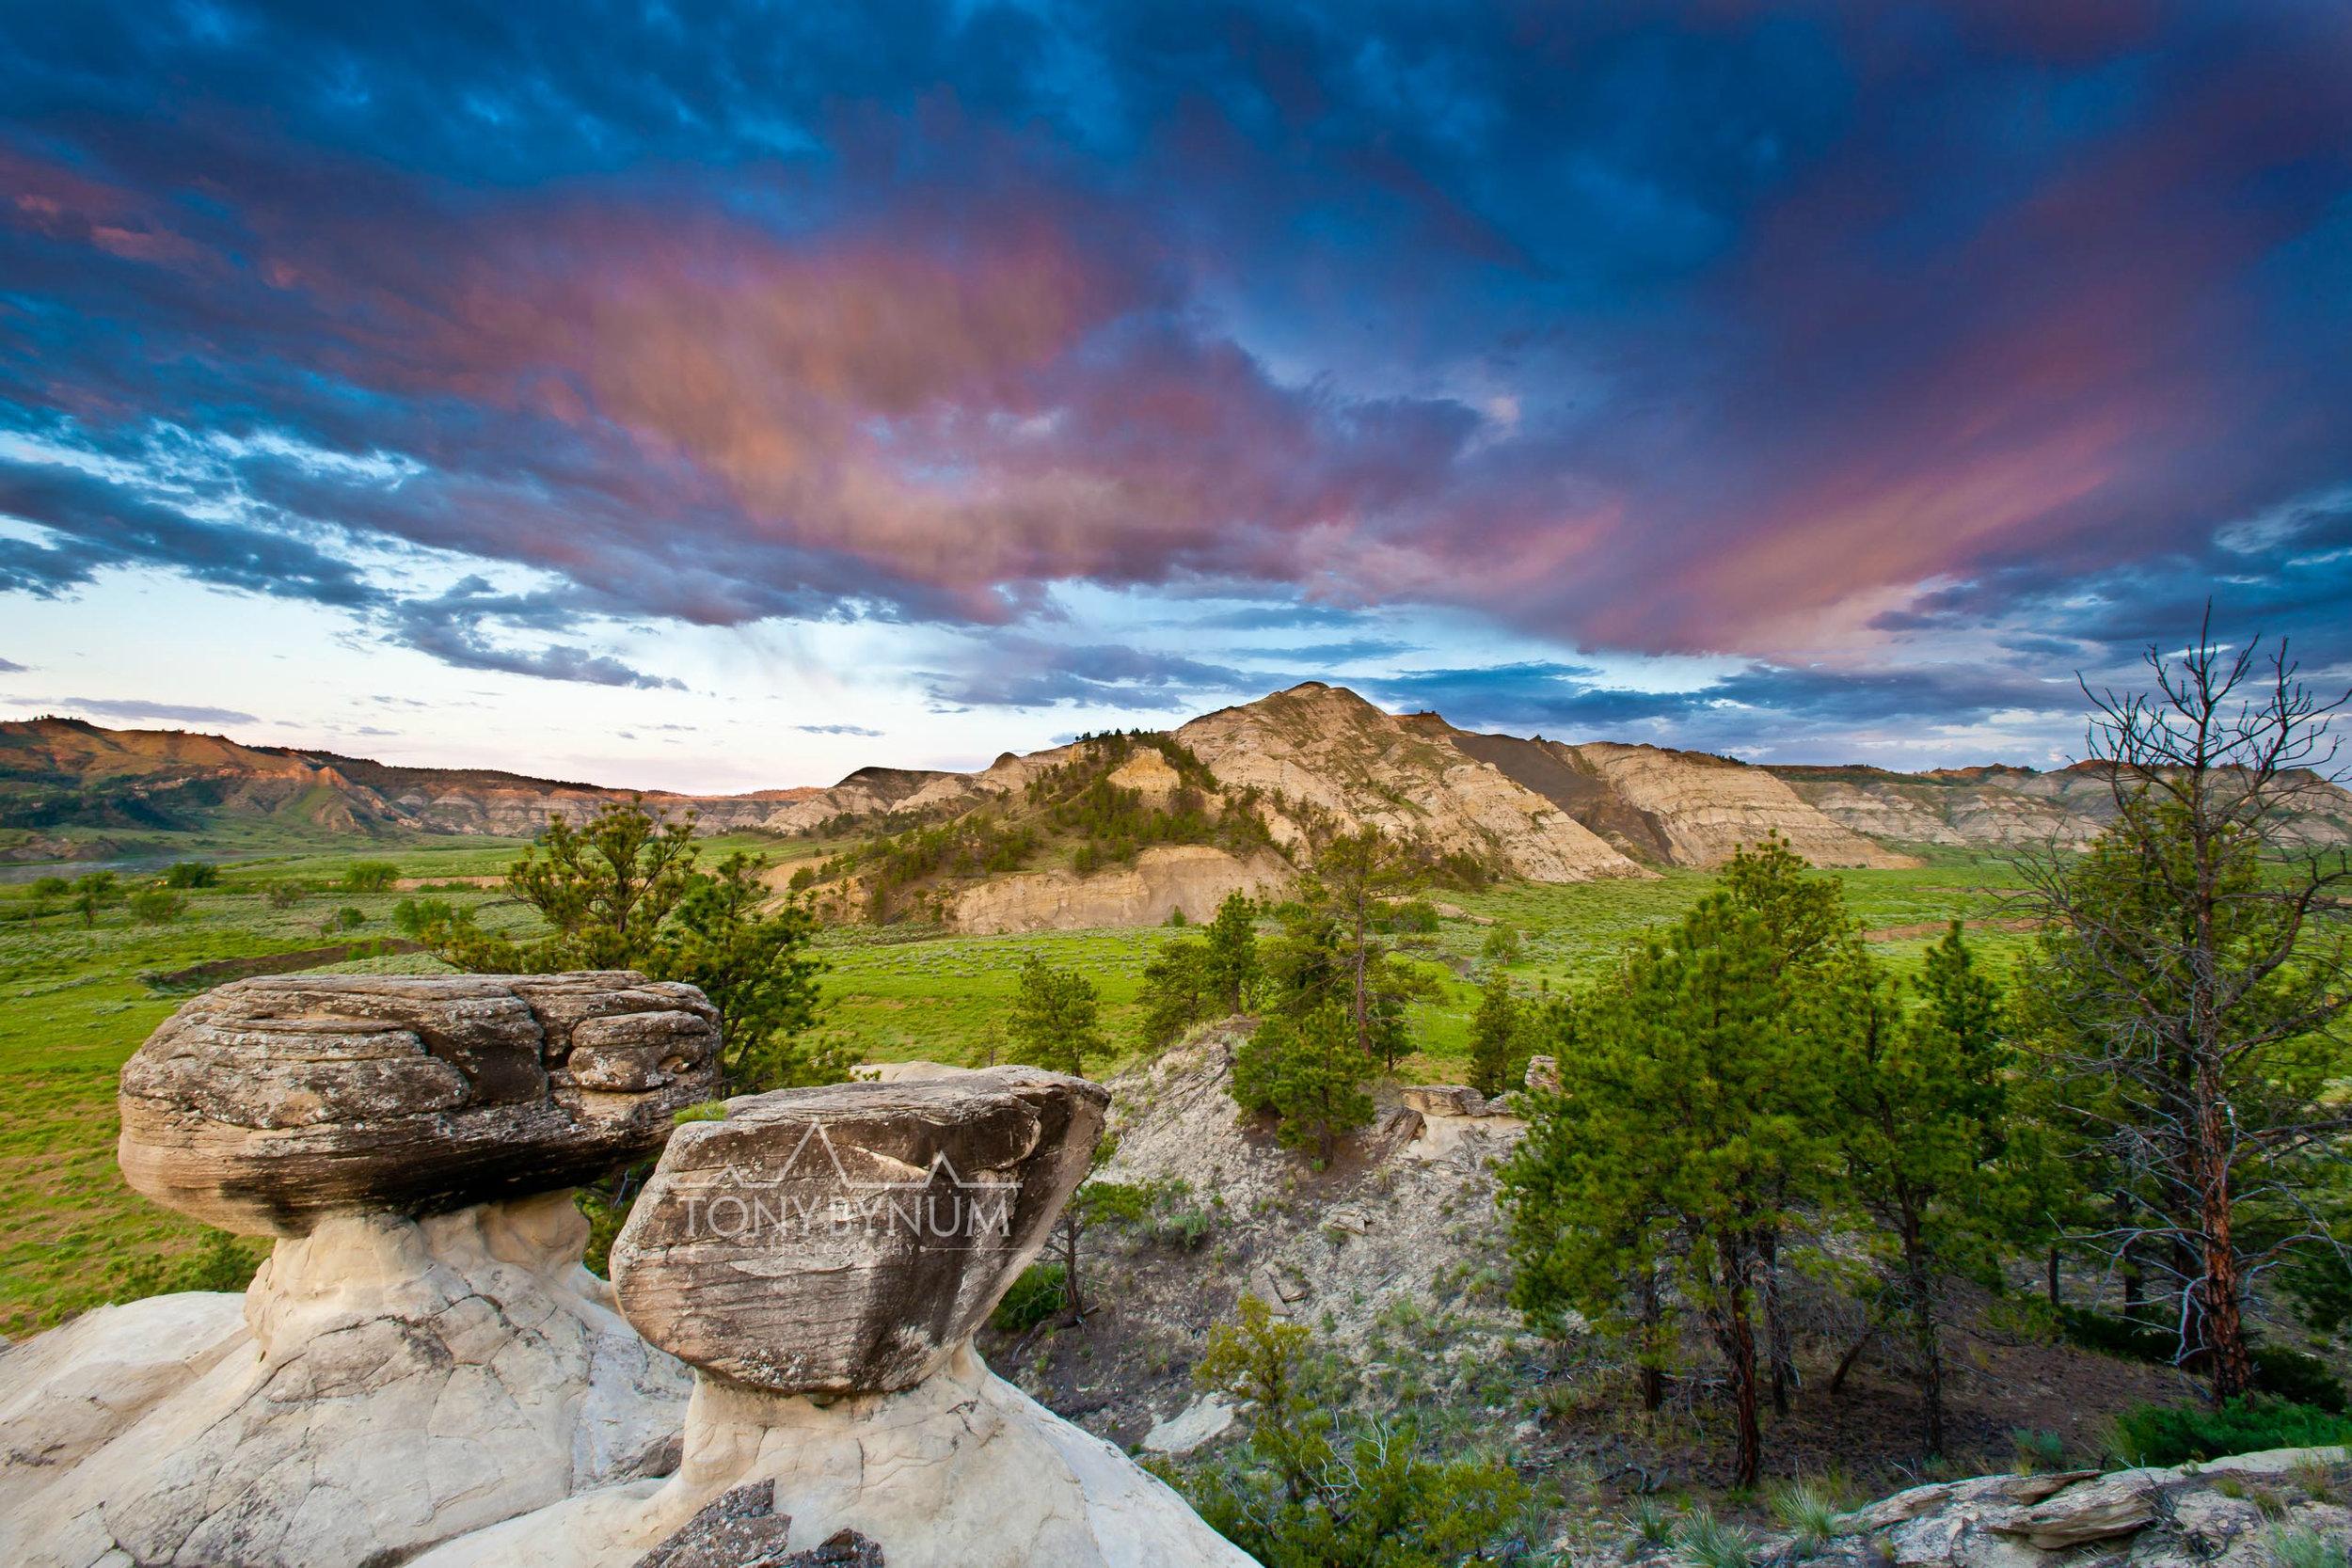 clouds over wild Montana prairie